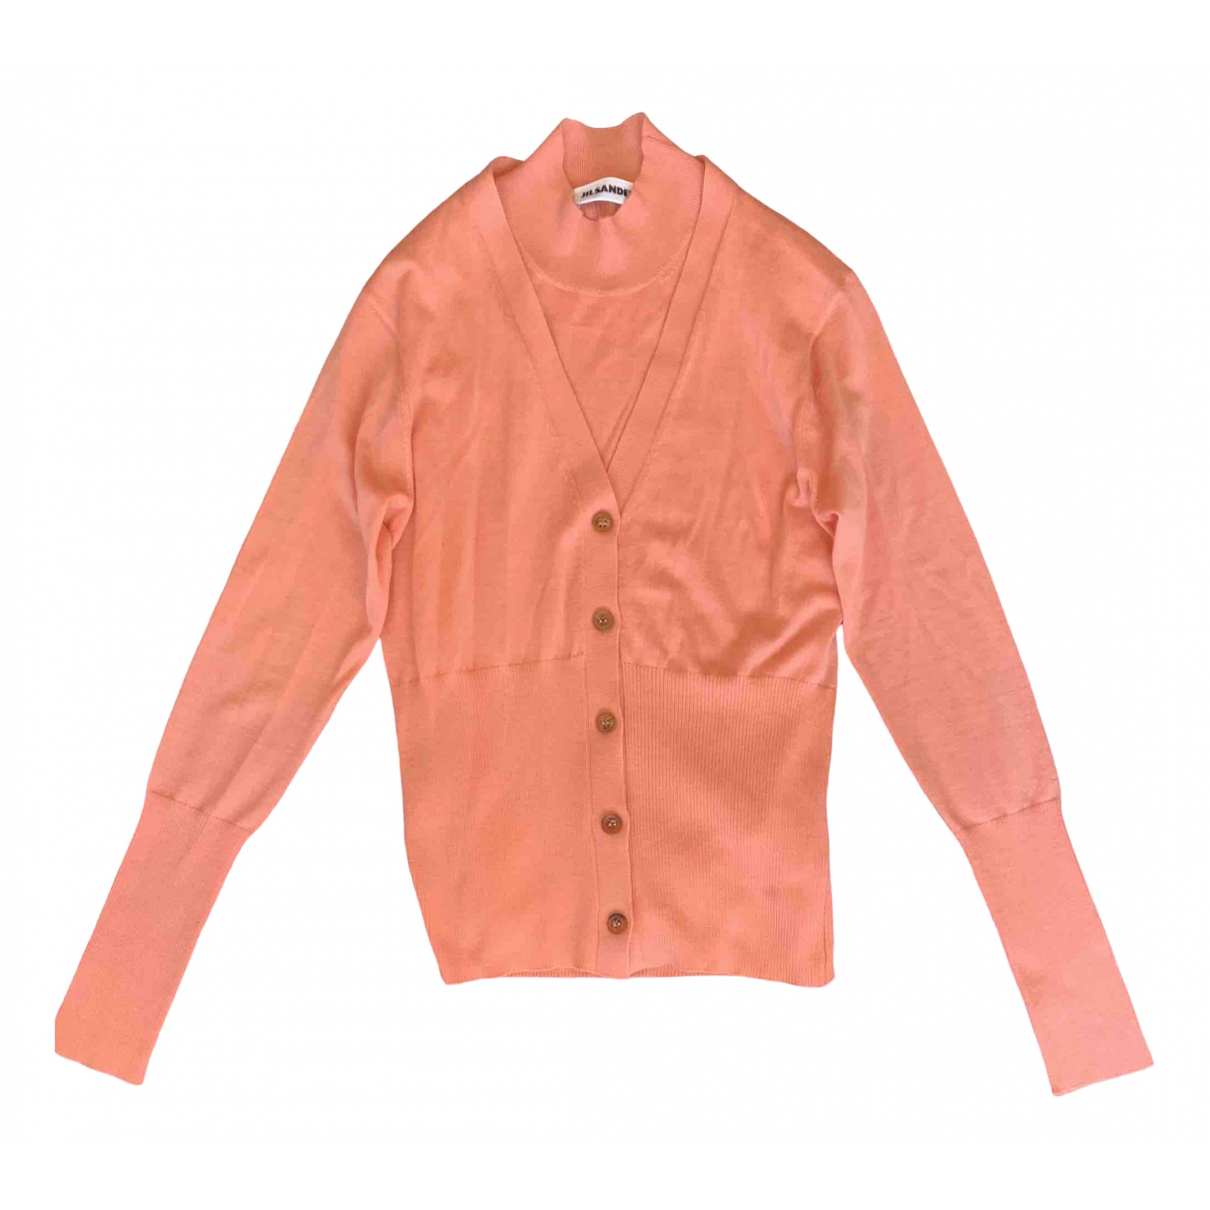 Jil Sander - Pull   pour femme en cachemire - rose